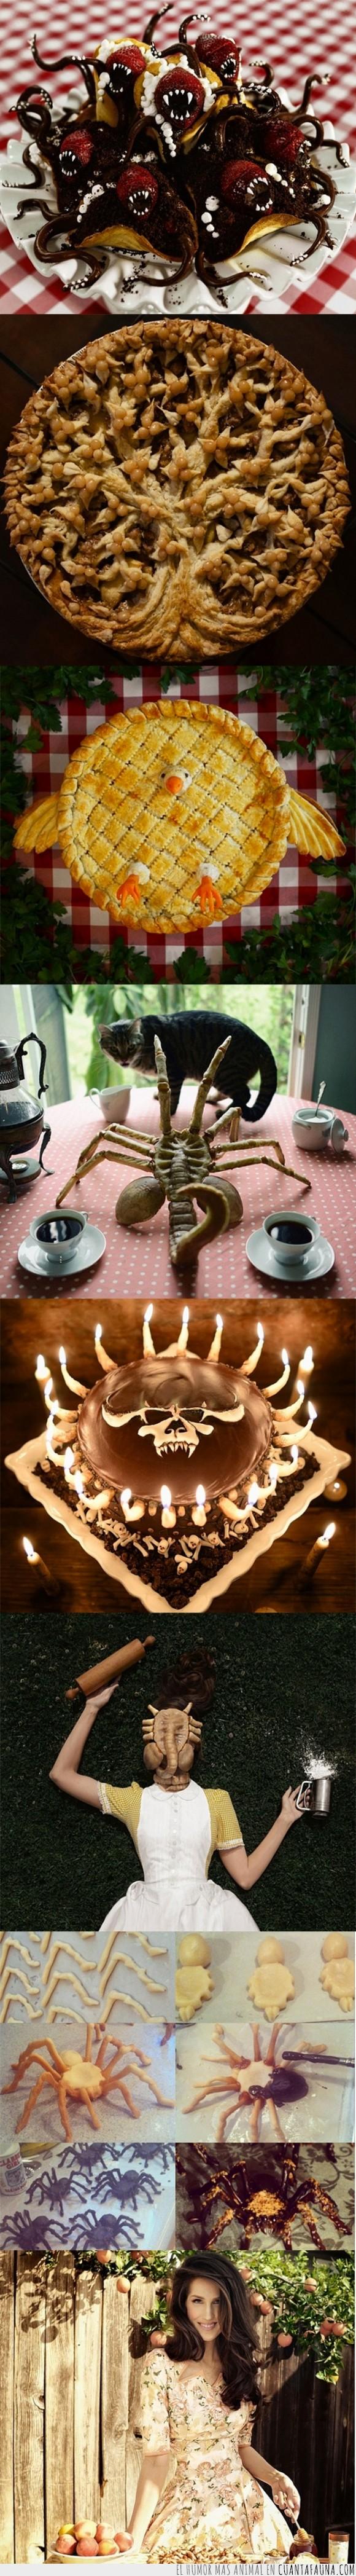 a lo tim burton,araña,christine mcconnell,decoración,gotico,pastel,reposteria,satan,tarta